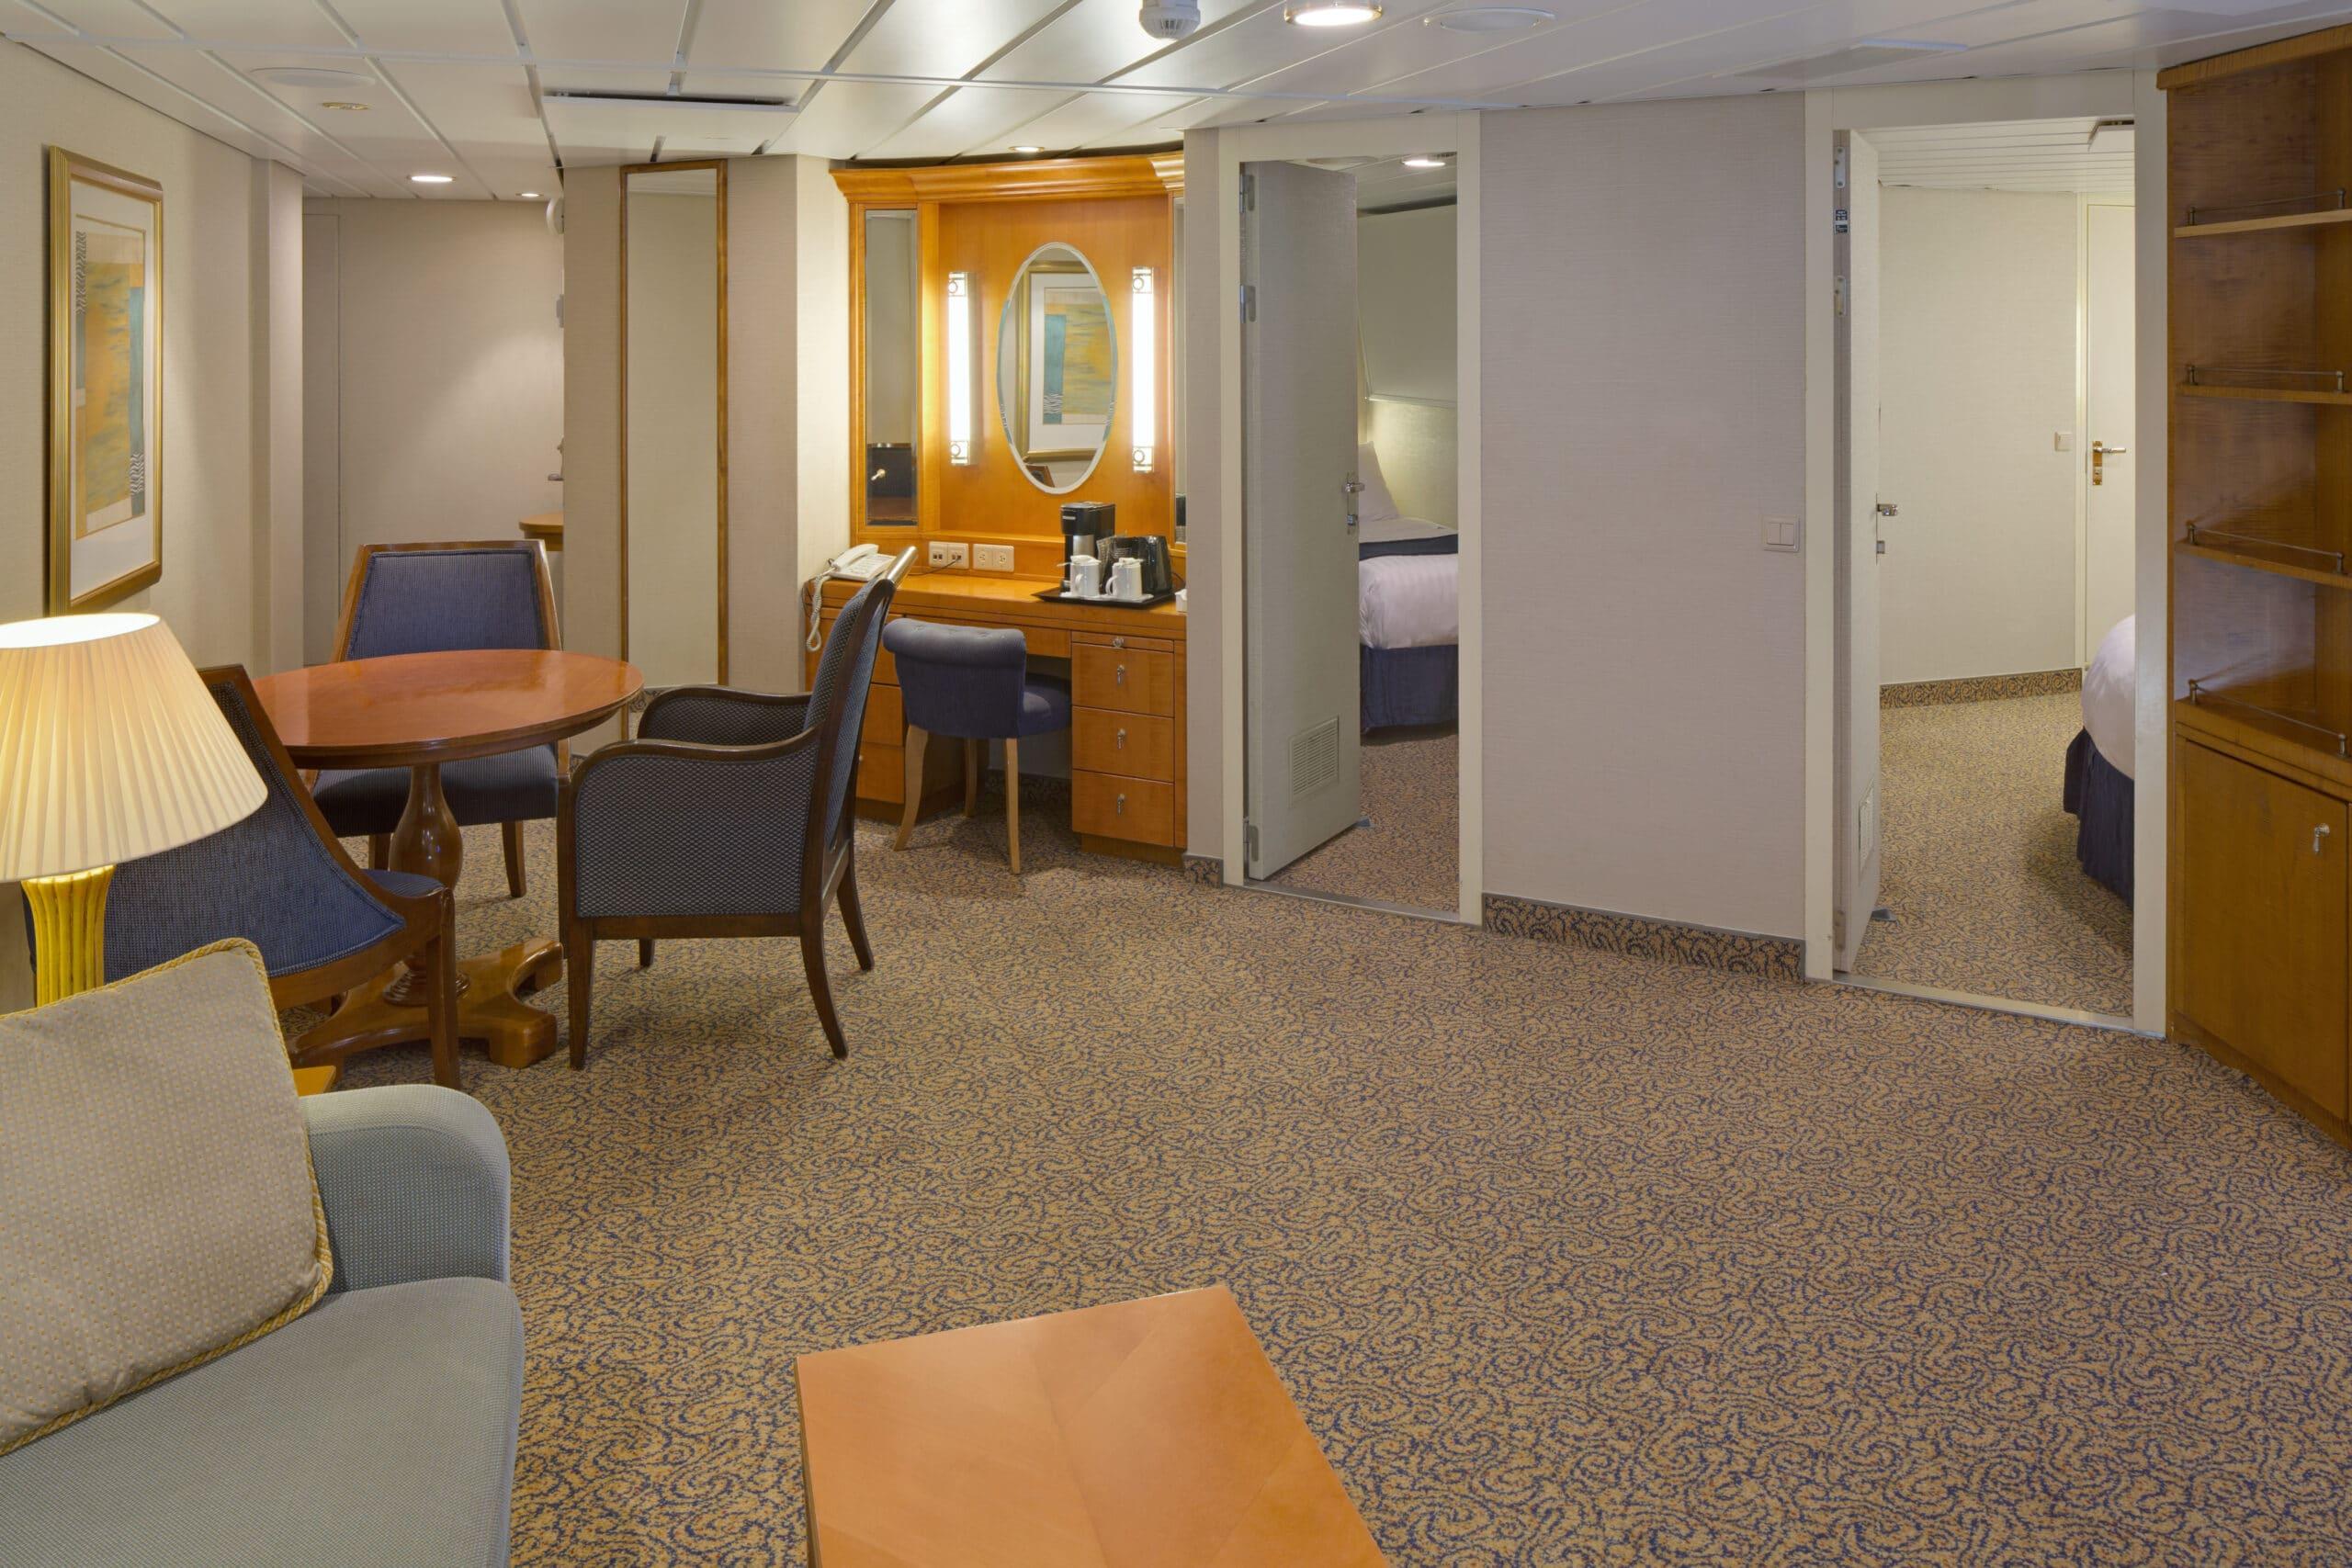 Royal-Caribbean-International-Brilliance-of-the-Seas-schip-cruiseschip-categorie-OT-Owner-Suite-2-bedroom